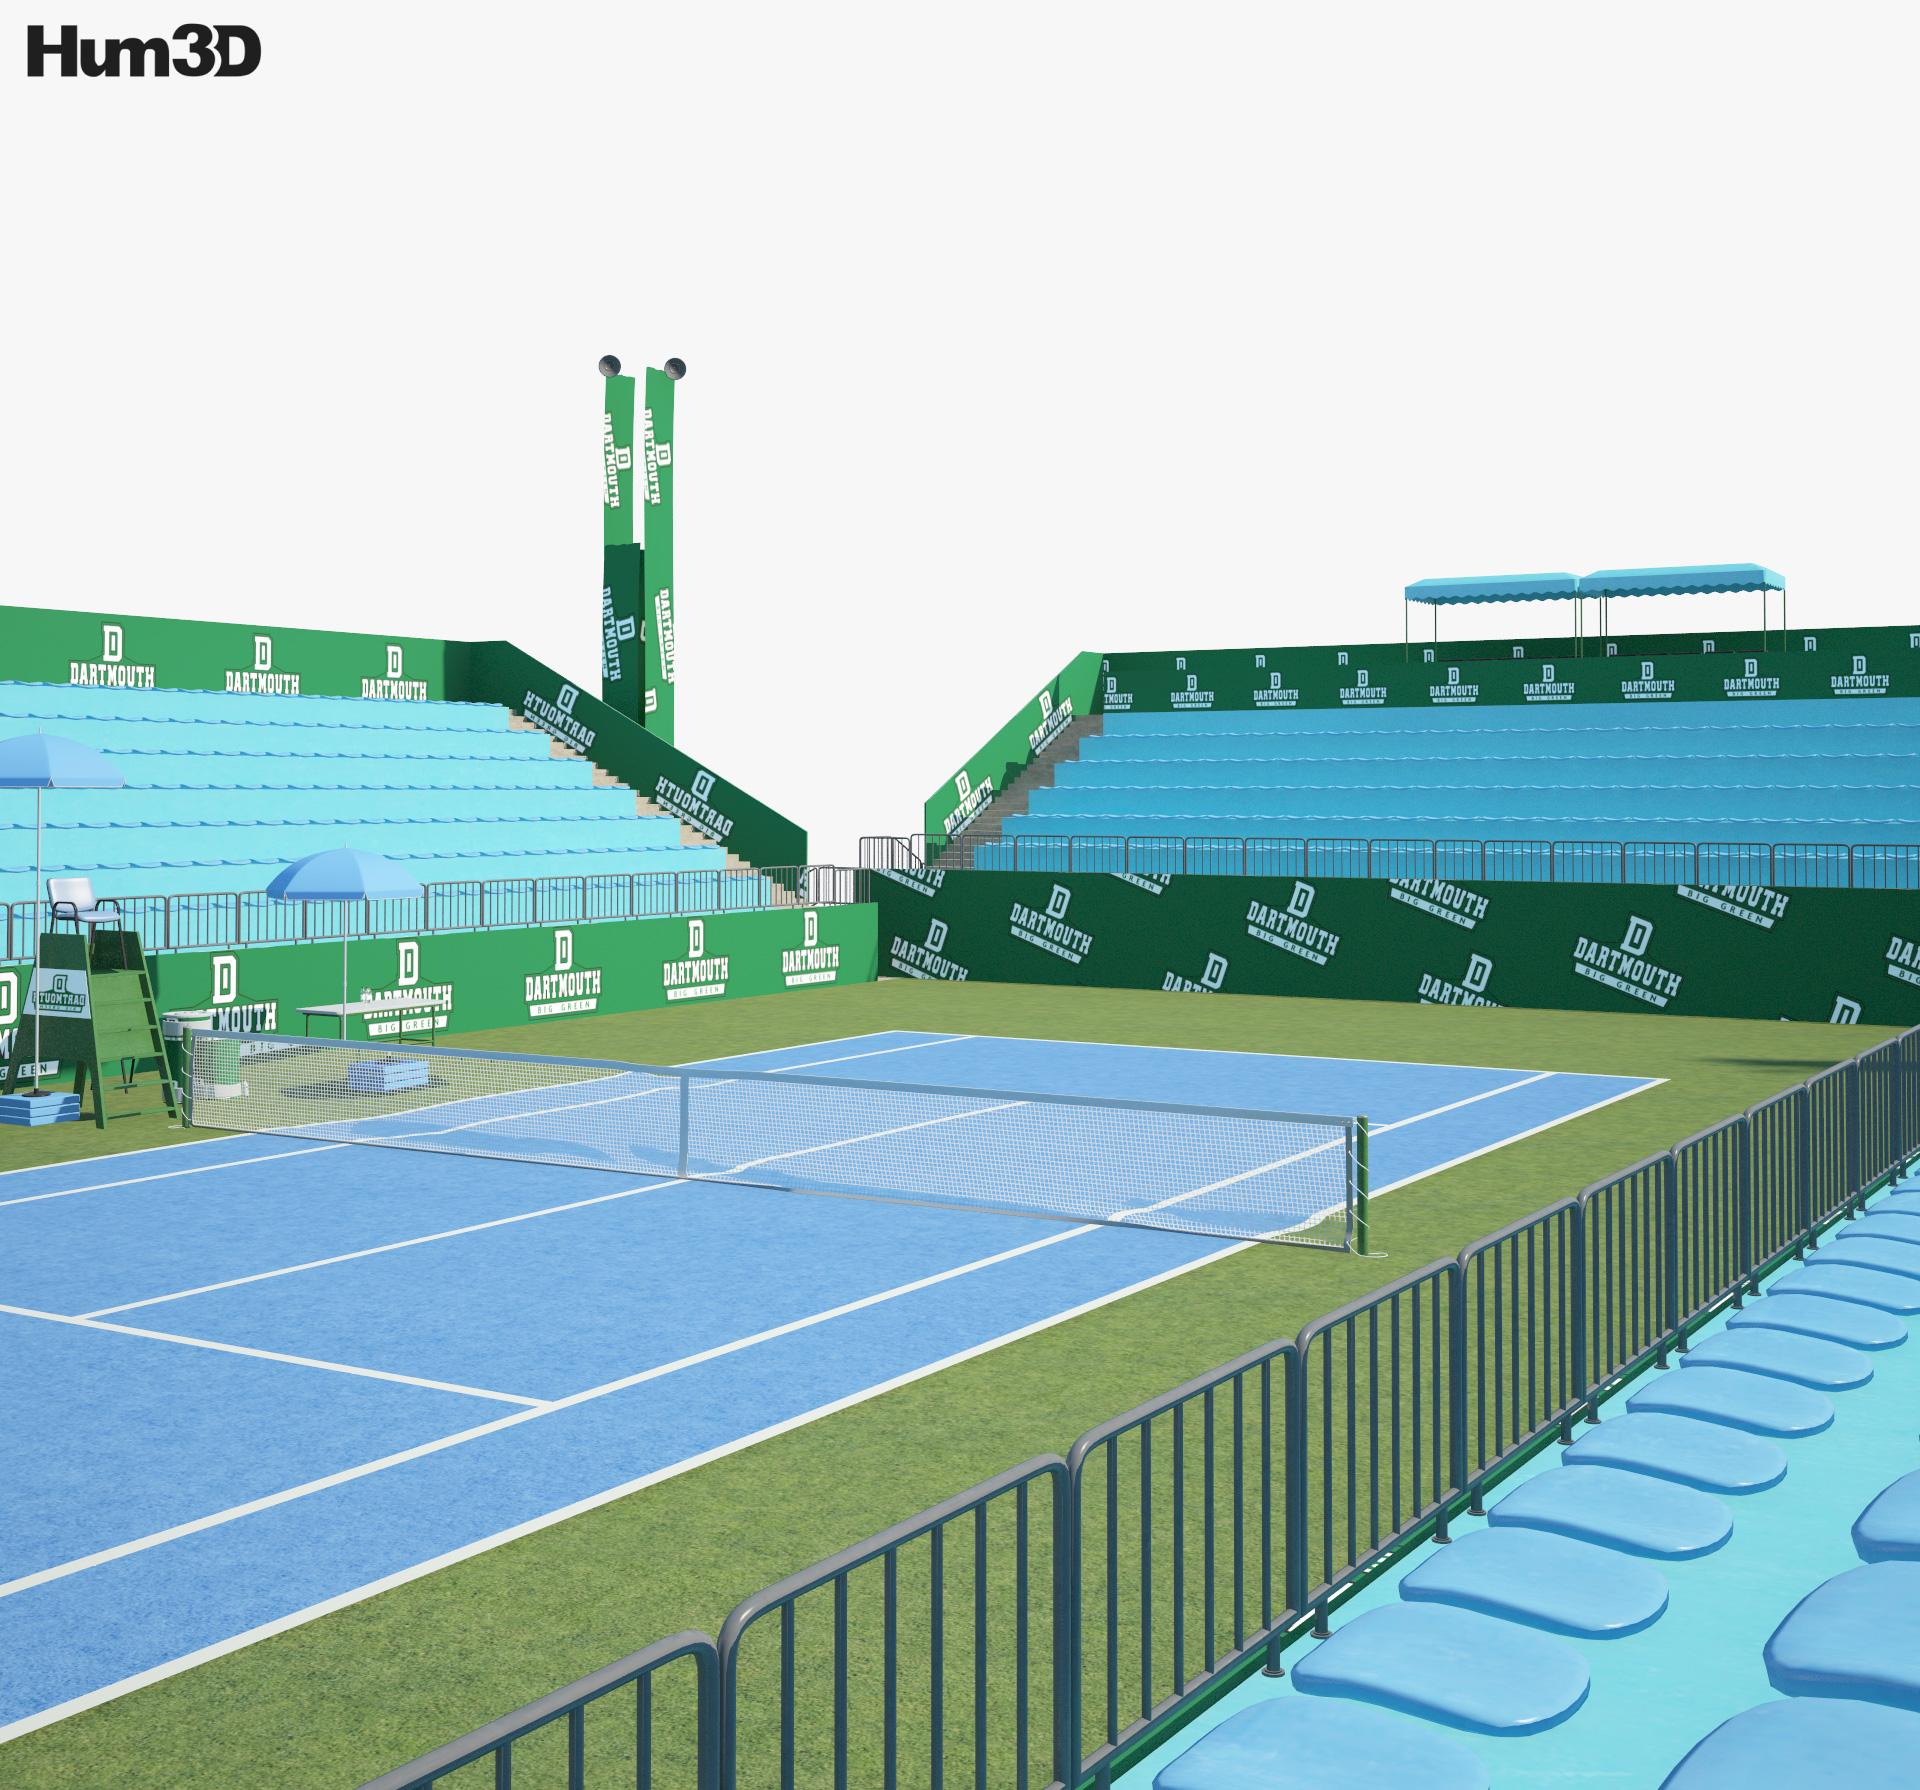 3D model of Tennis Arena